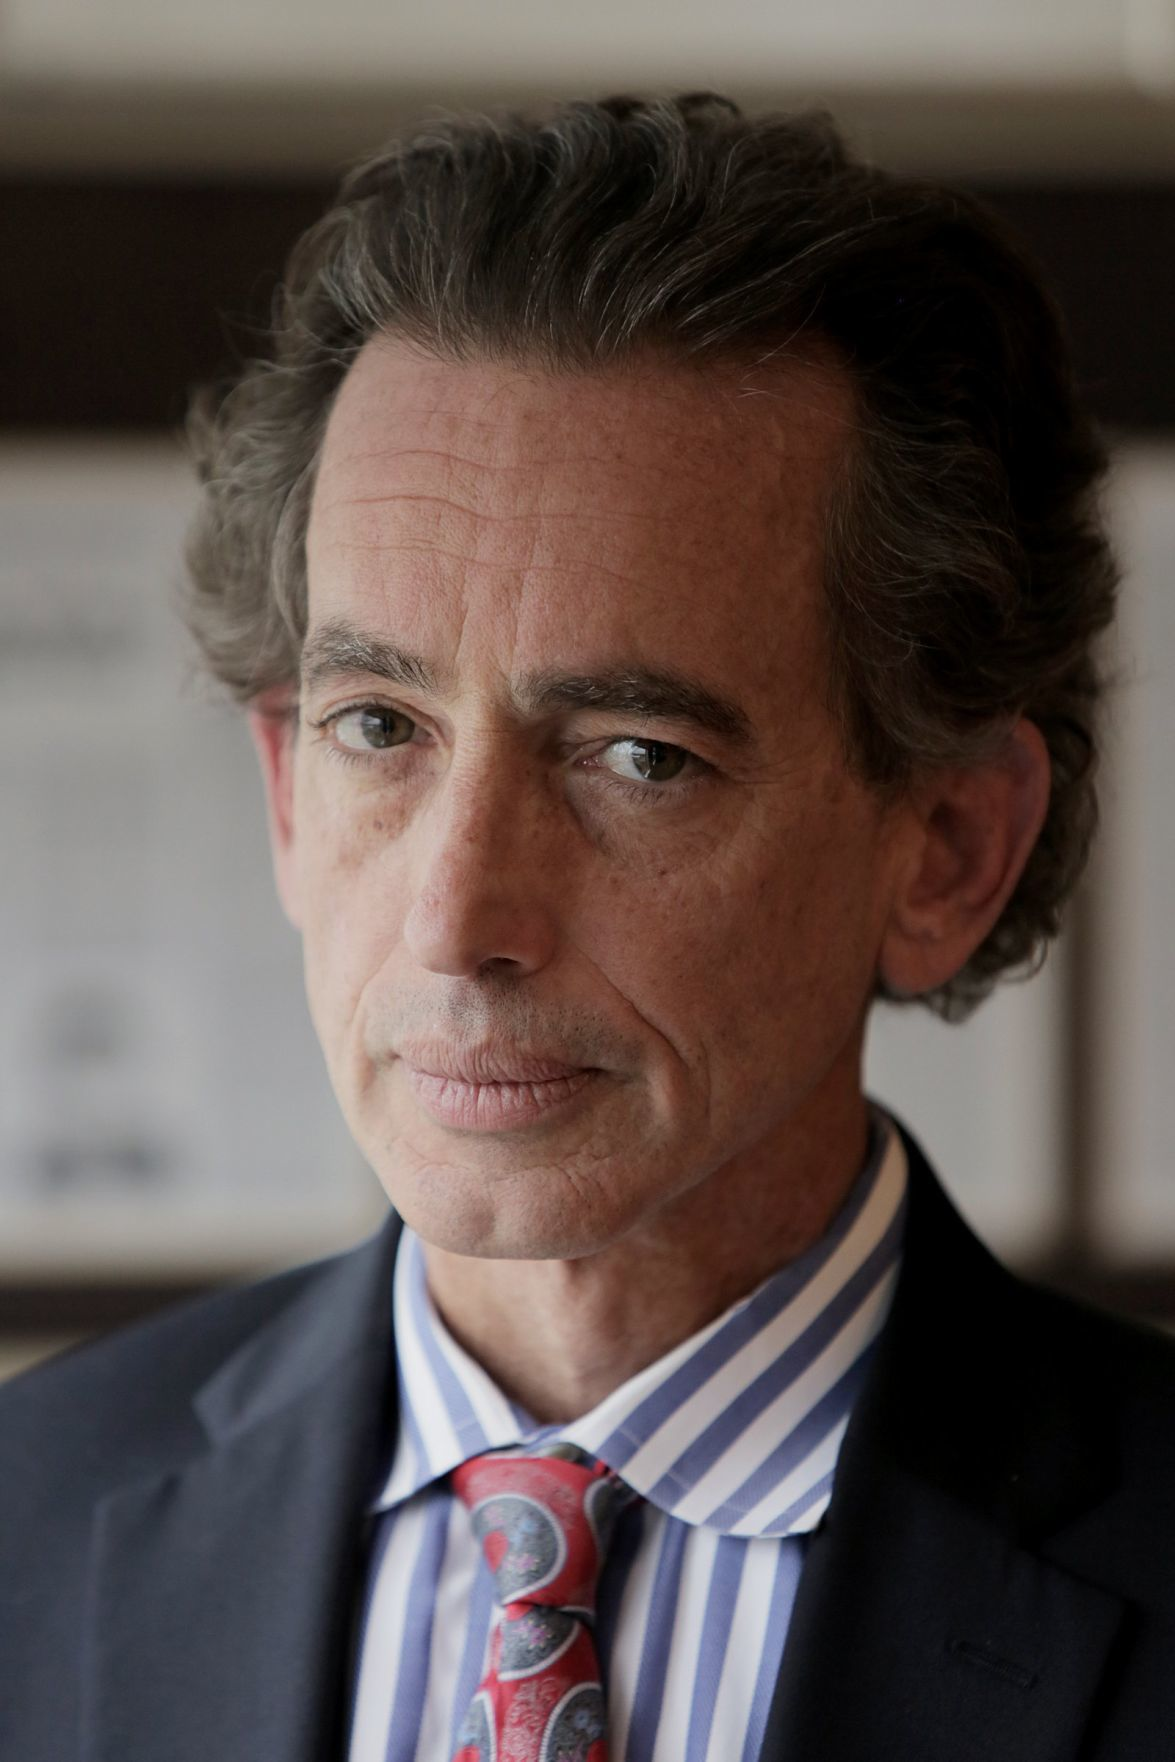 PolitiFact   Did accuser in Eric Greitens sex case say